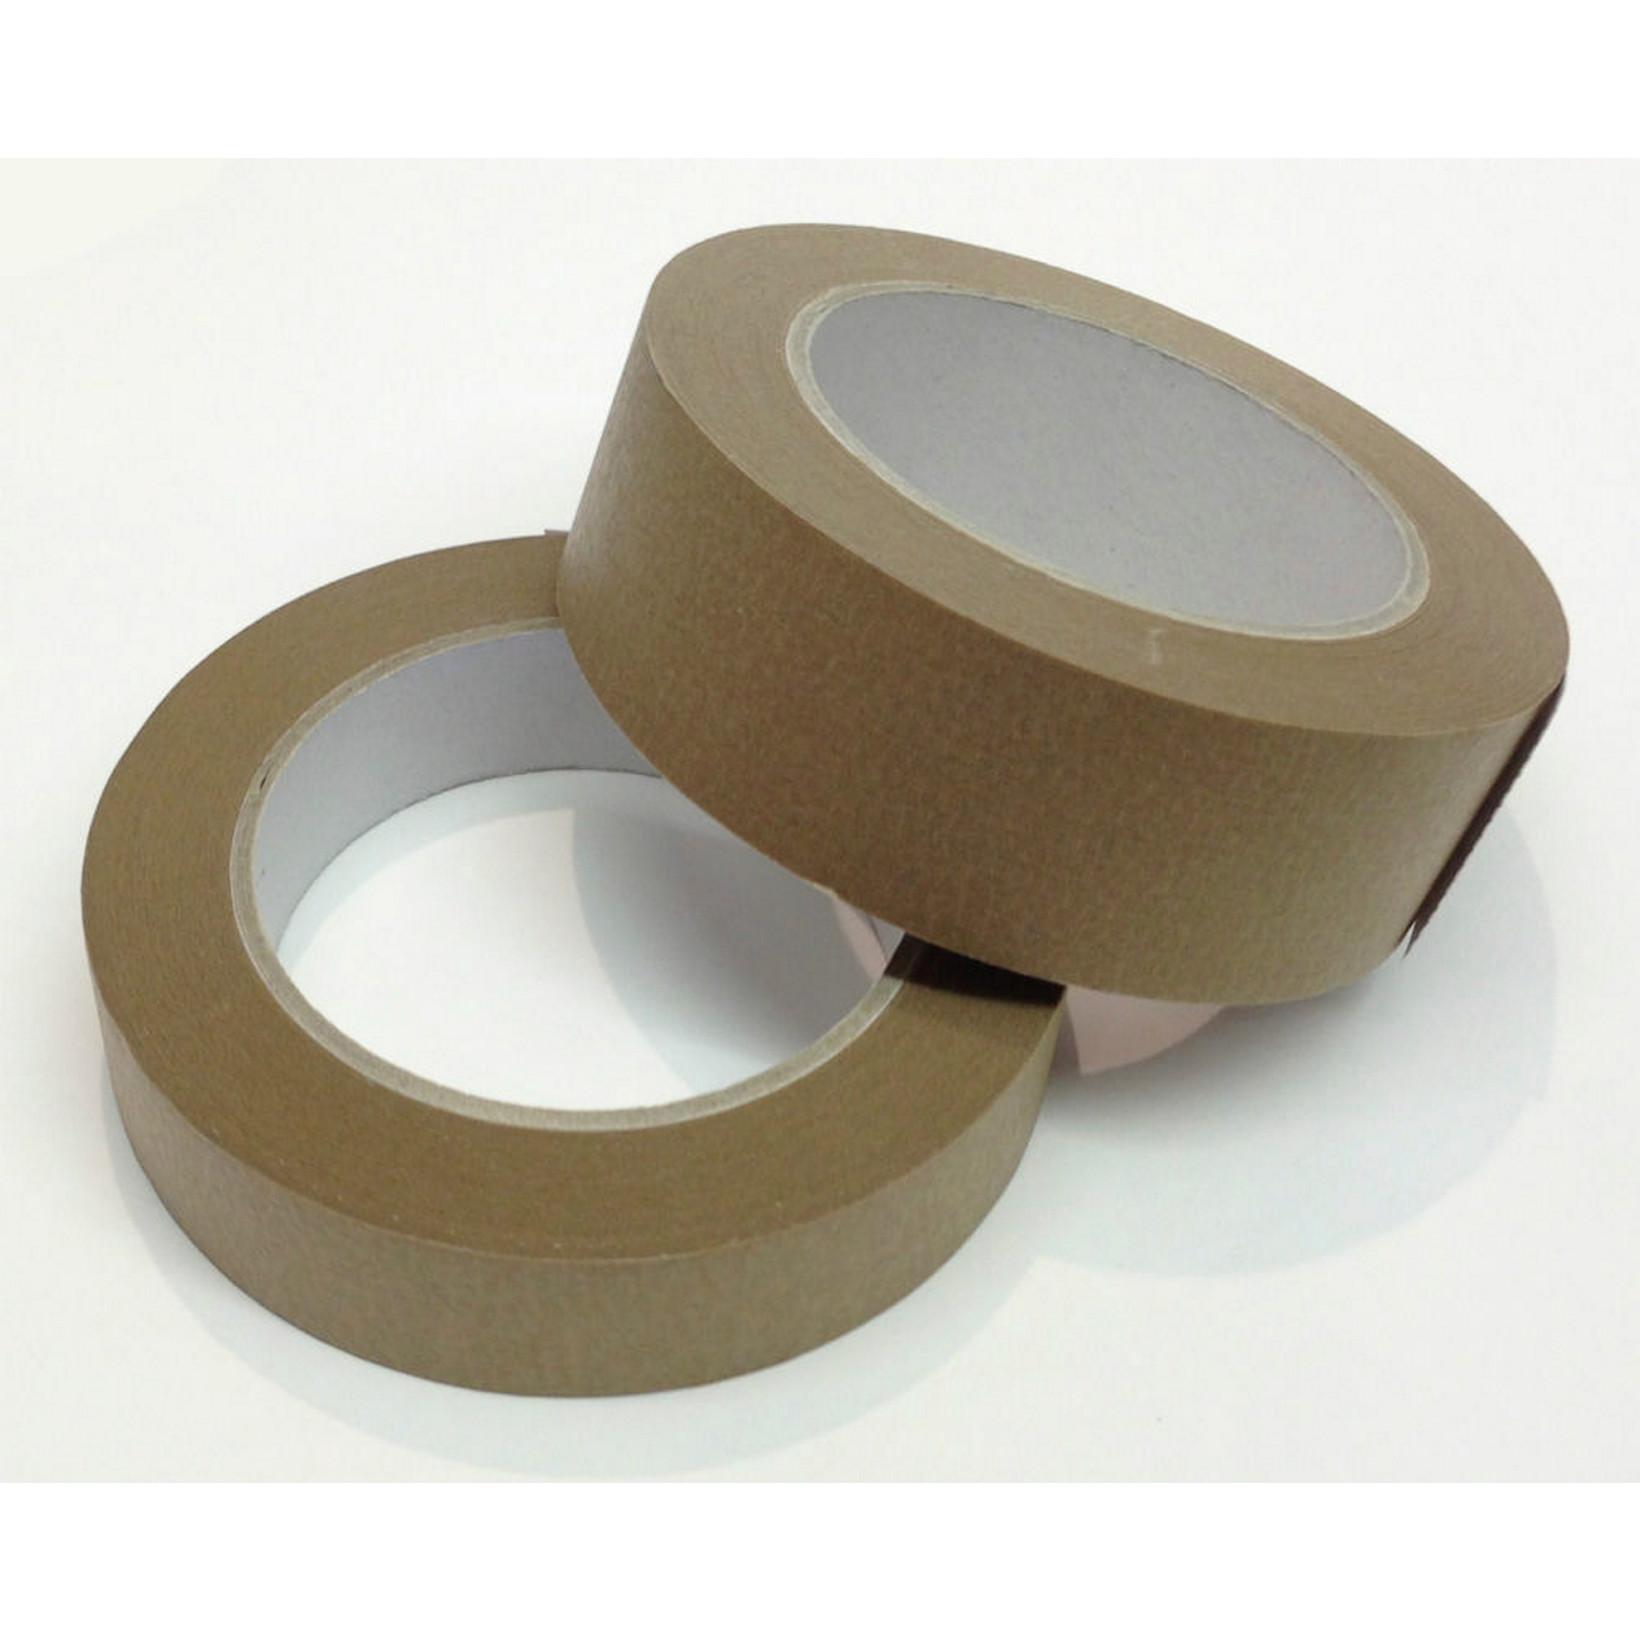 Tape PVC32-s i brun - 38 mm x 66 meter